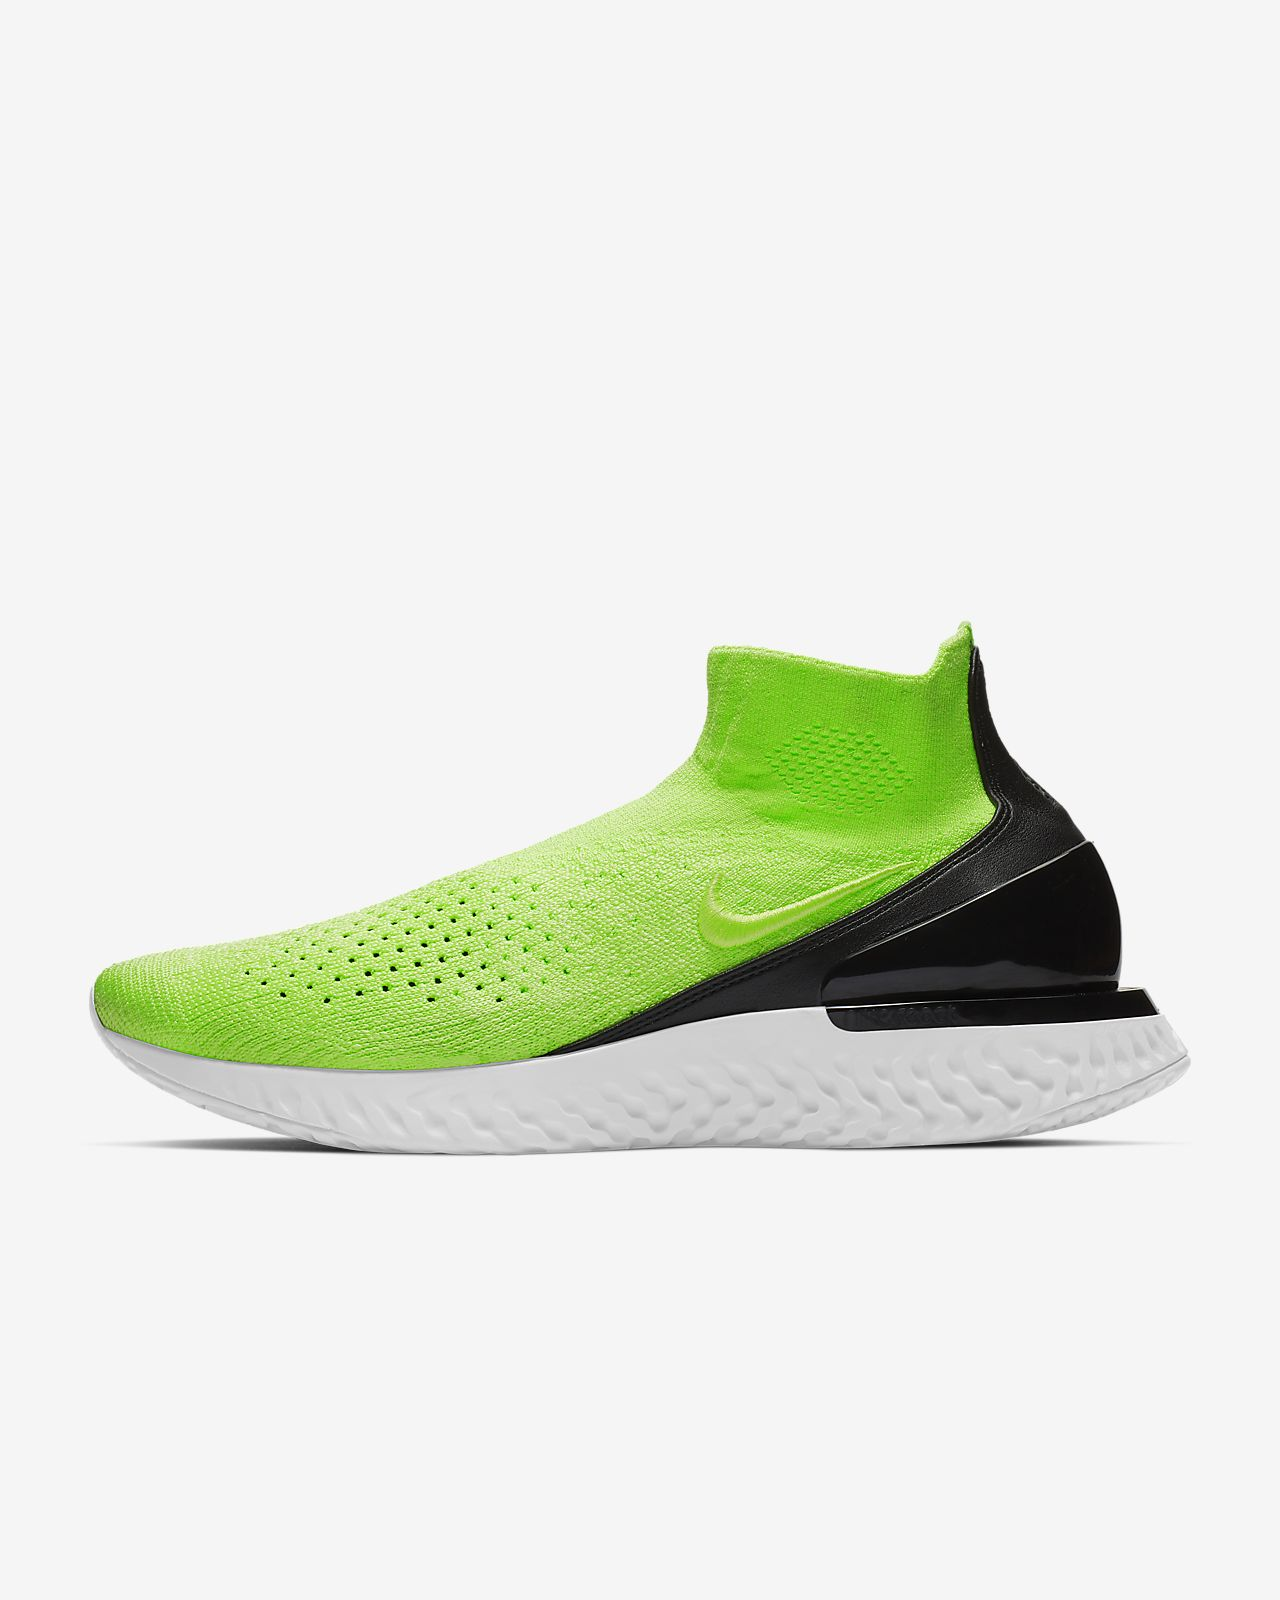 Nike Rise React Flyknit Running Shoe